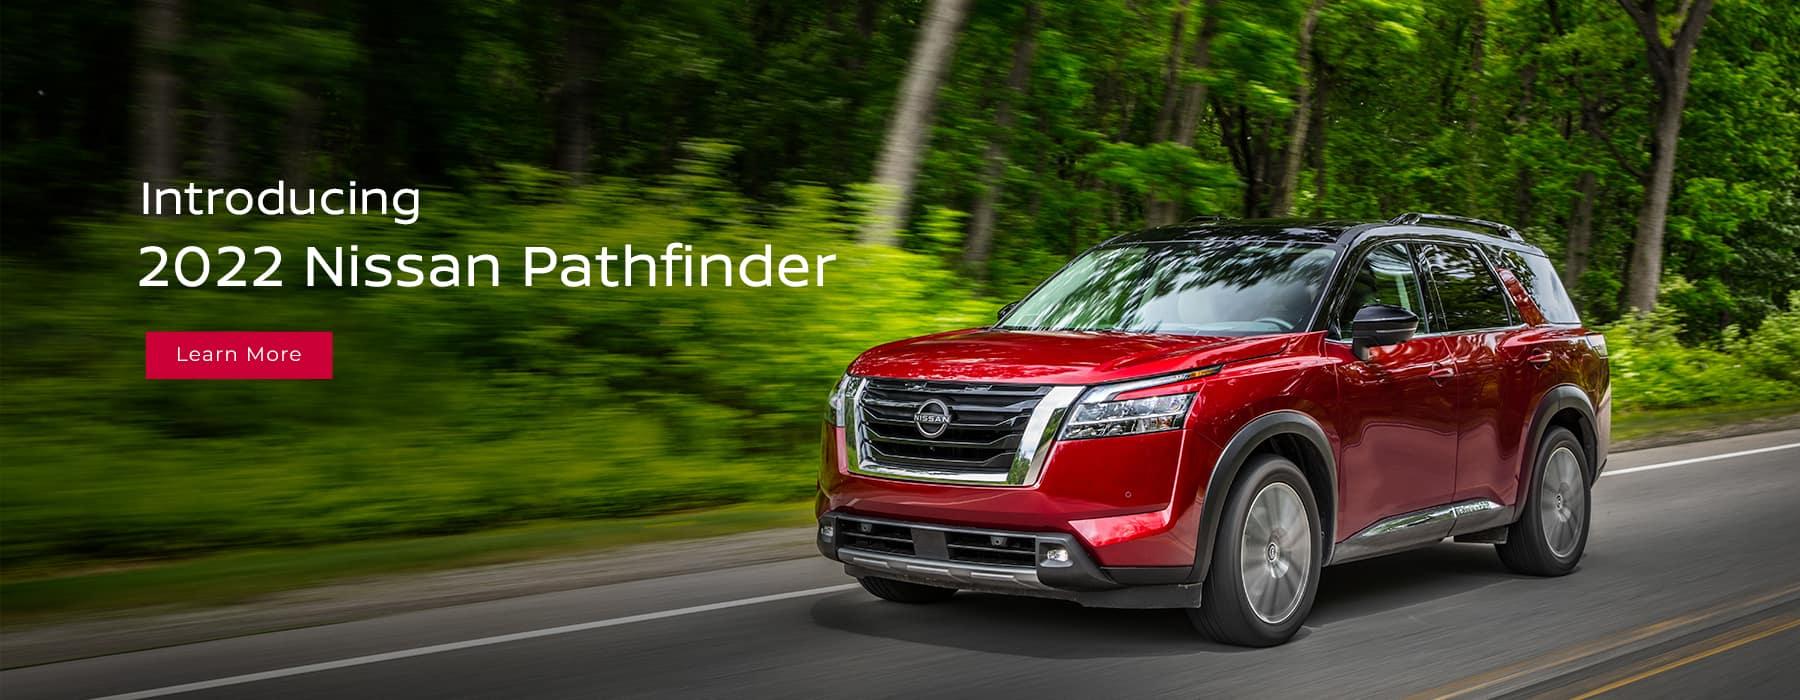 Intro-2022-Nissan Pathfindere-Homepage-Nissan